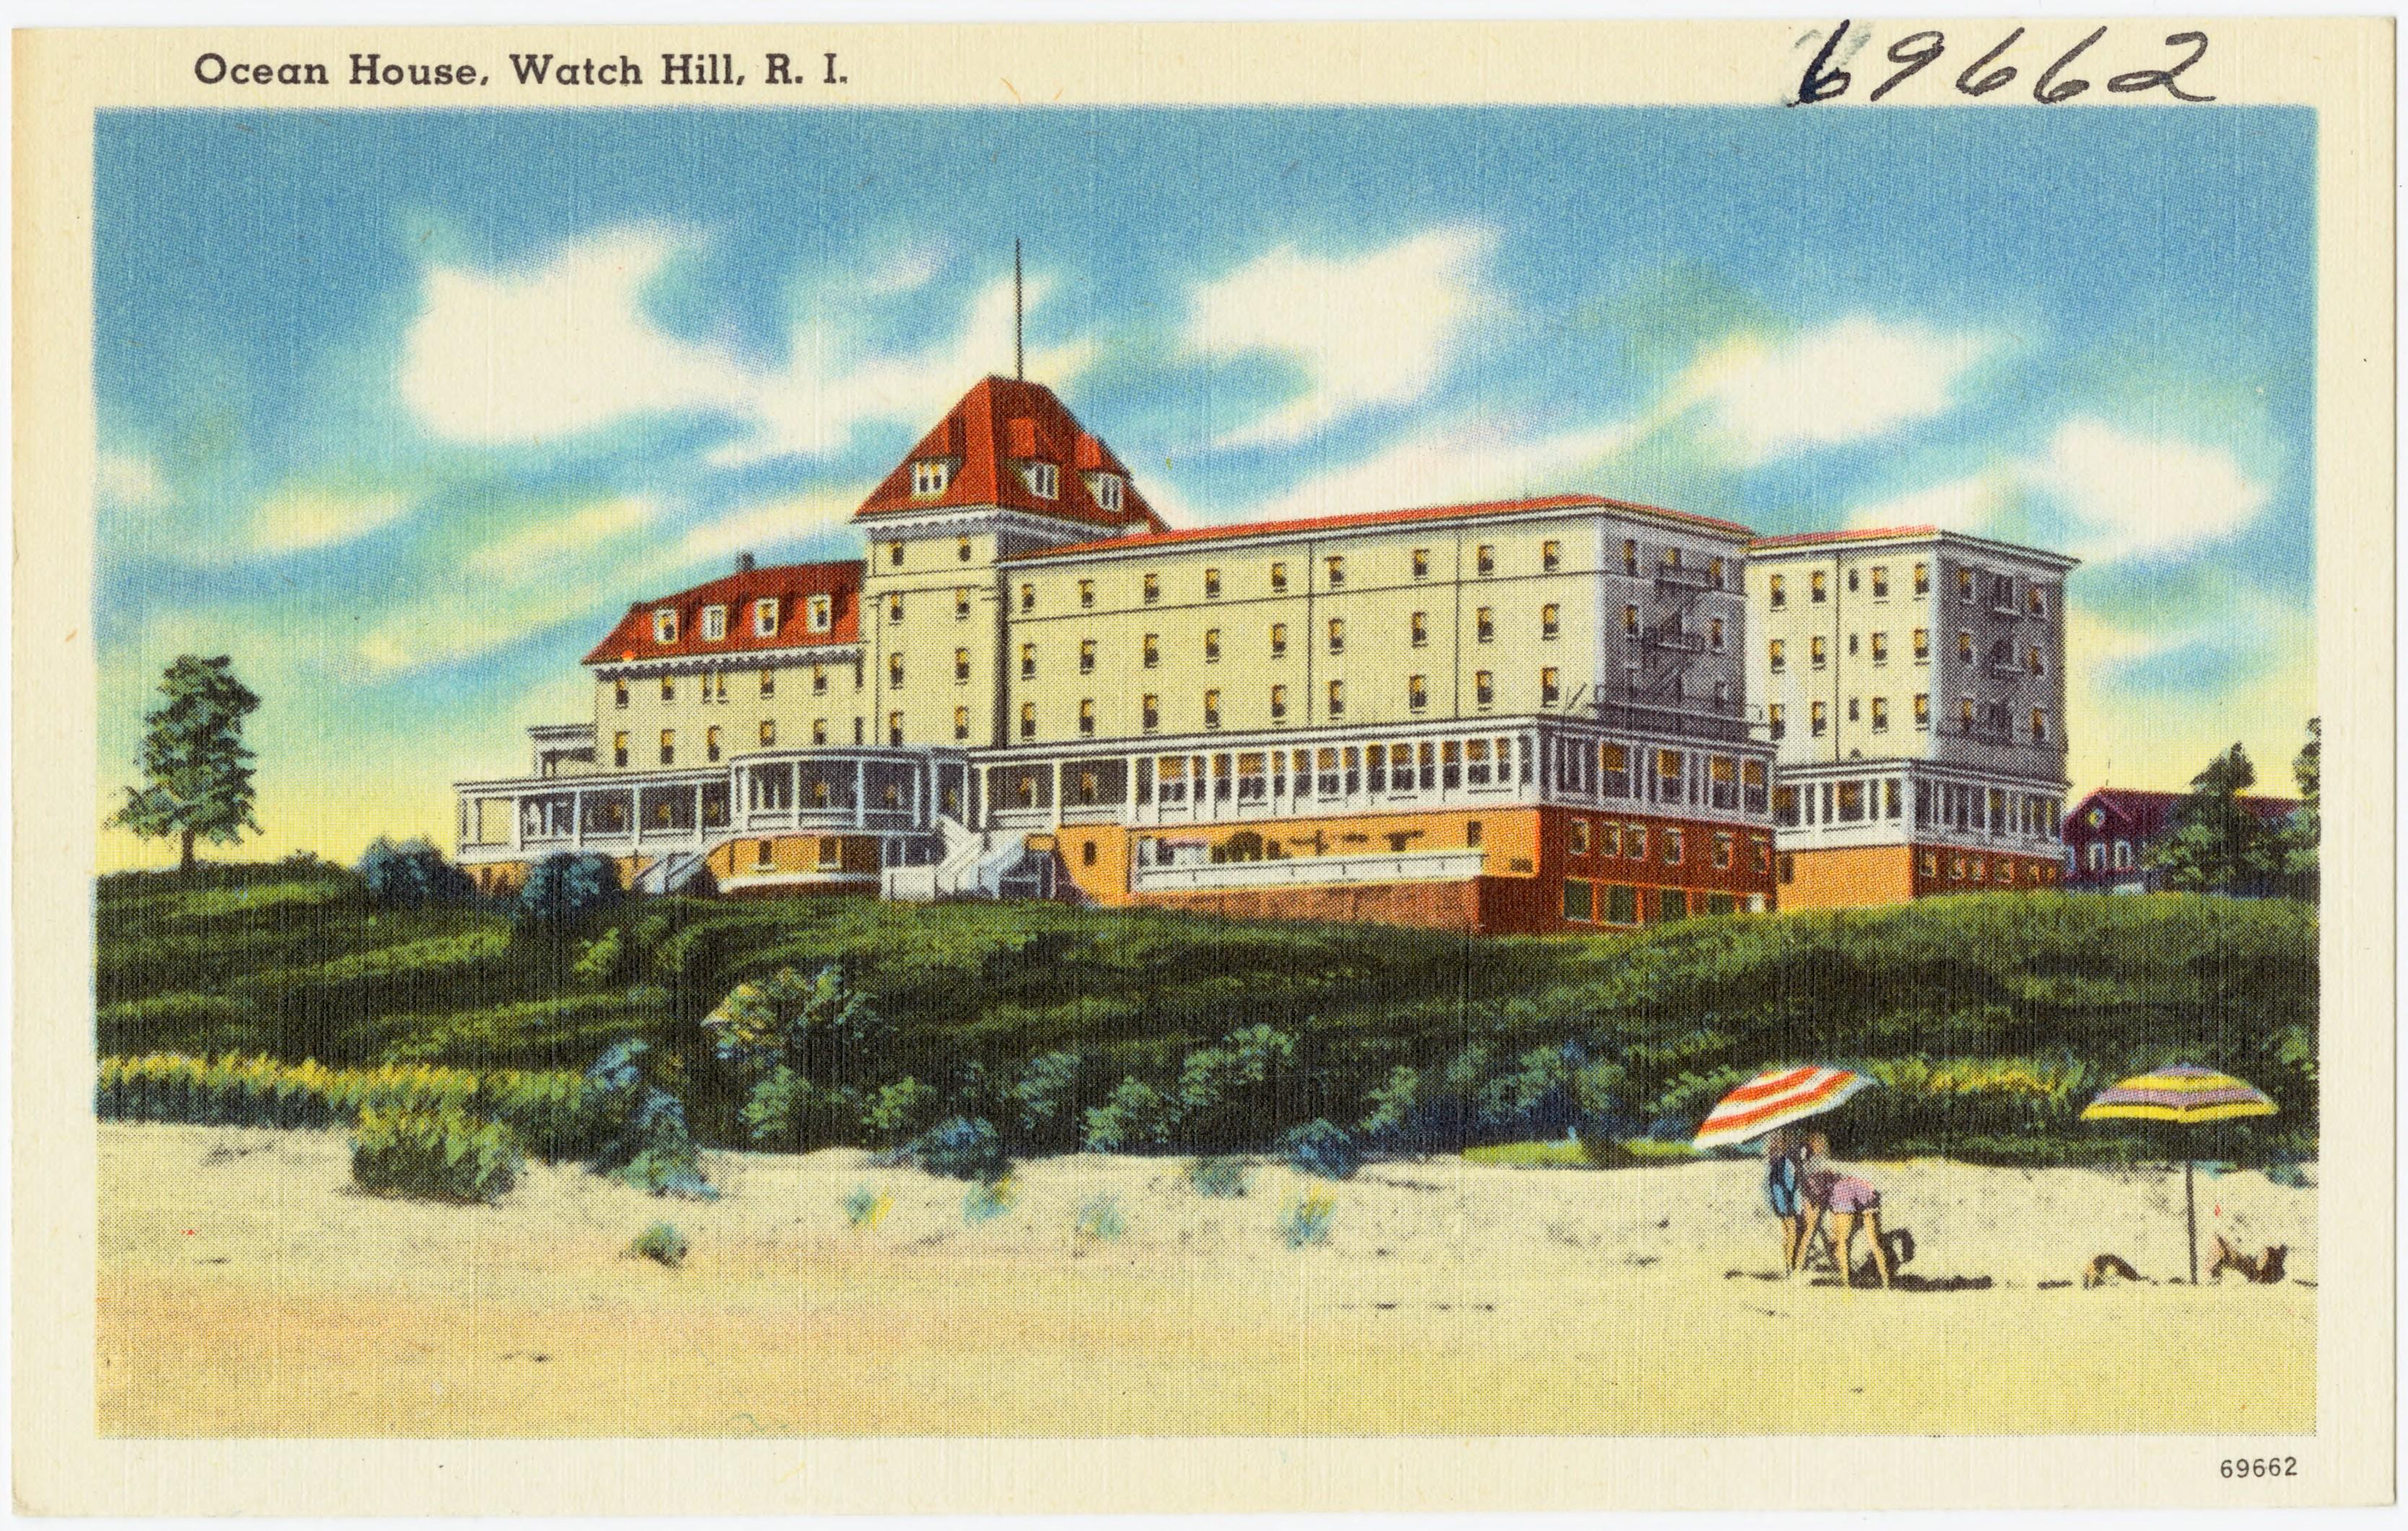 File Ocean House, Watch Hill, R I (69662) jpg Wikimedia Commons